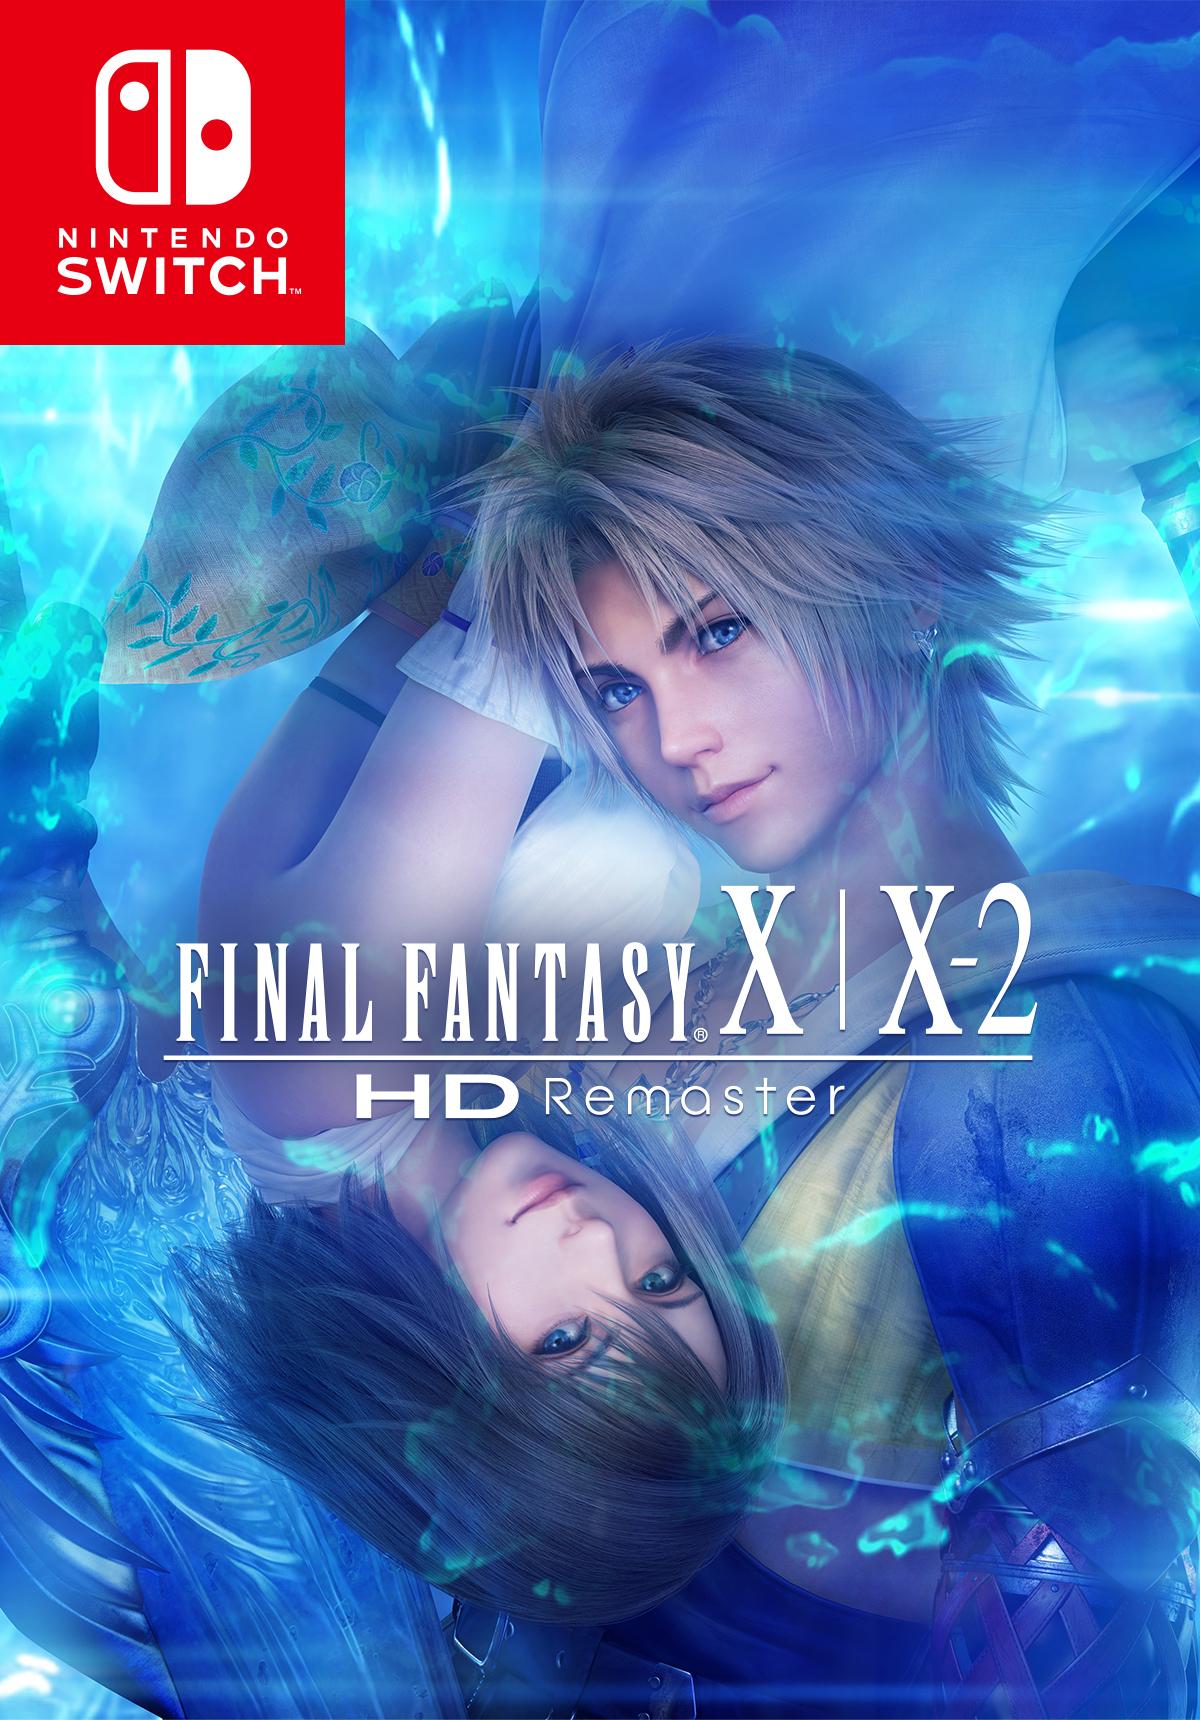 Final Fantasy X/X-2 HD Remaster sur Switch